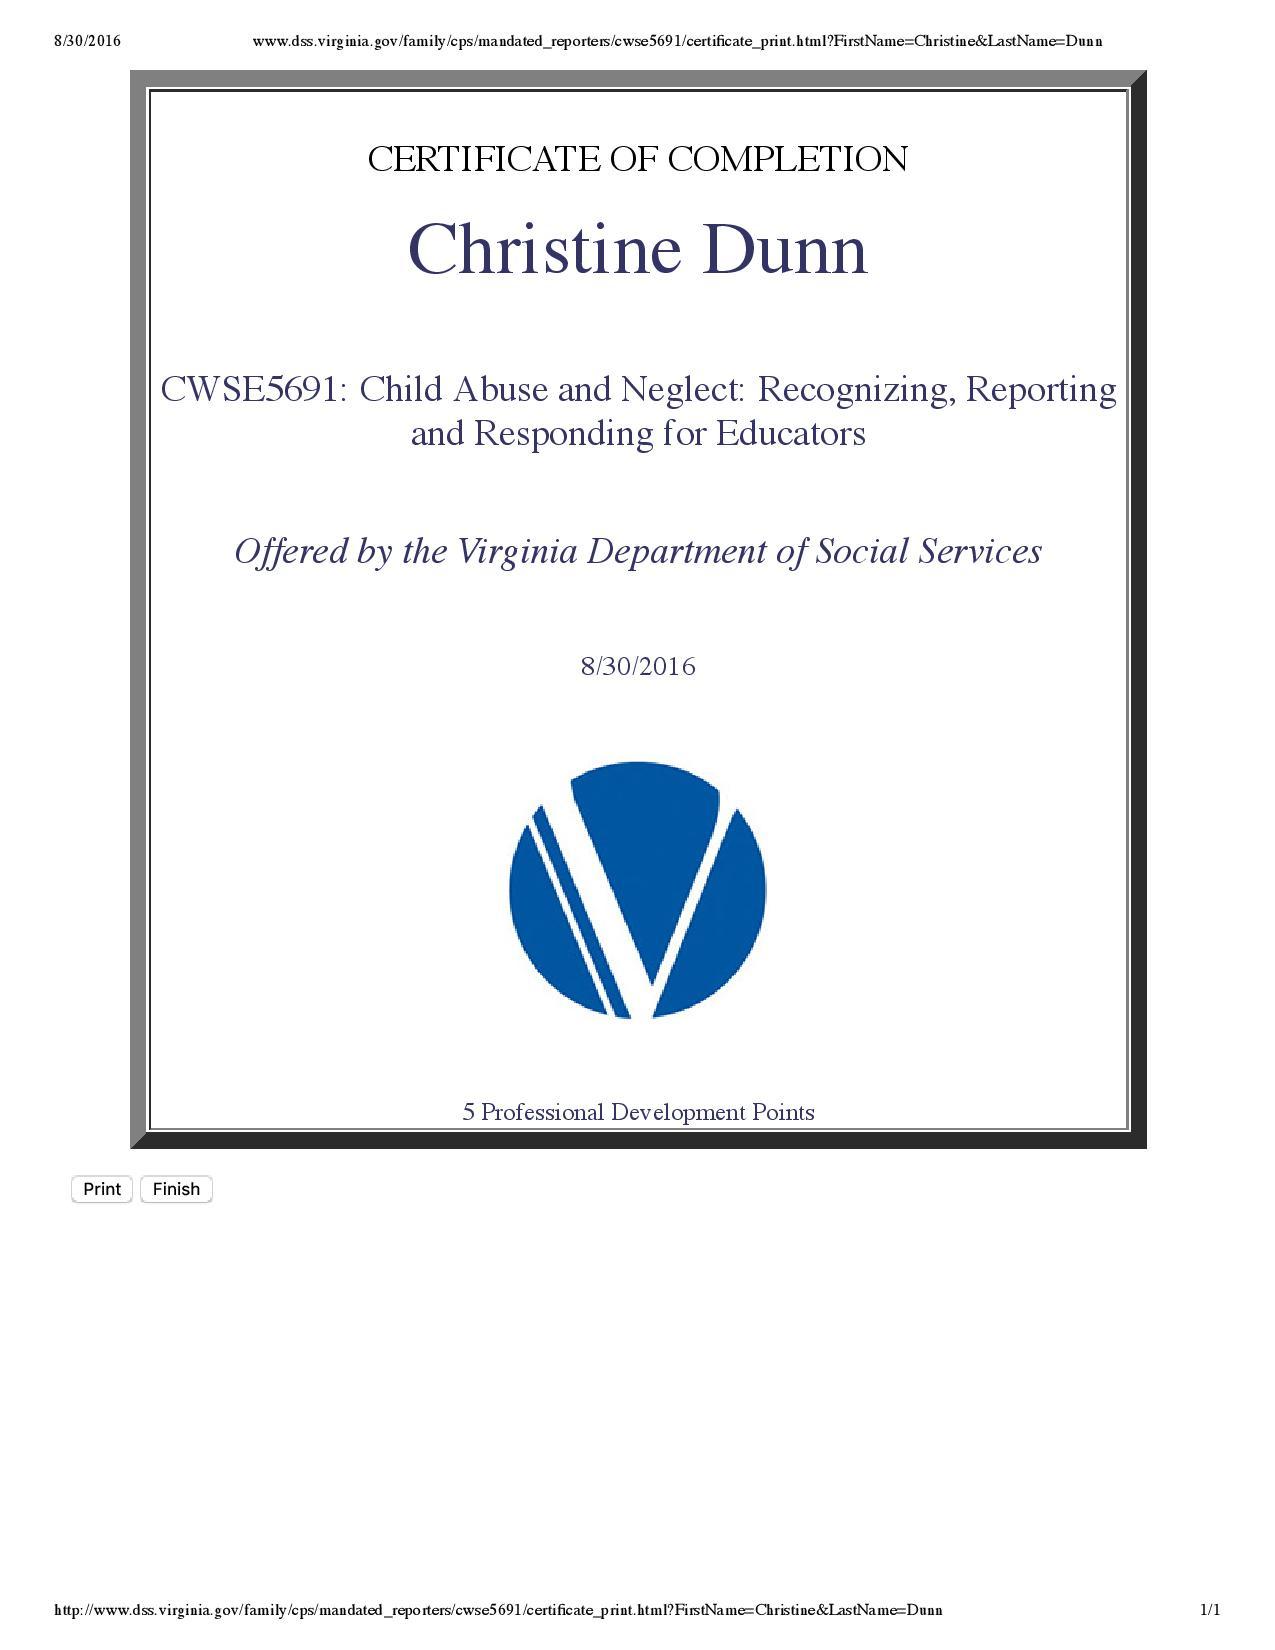 Child Abuse Certificate Christine A Dunn Future Educator